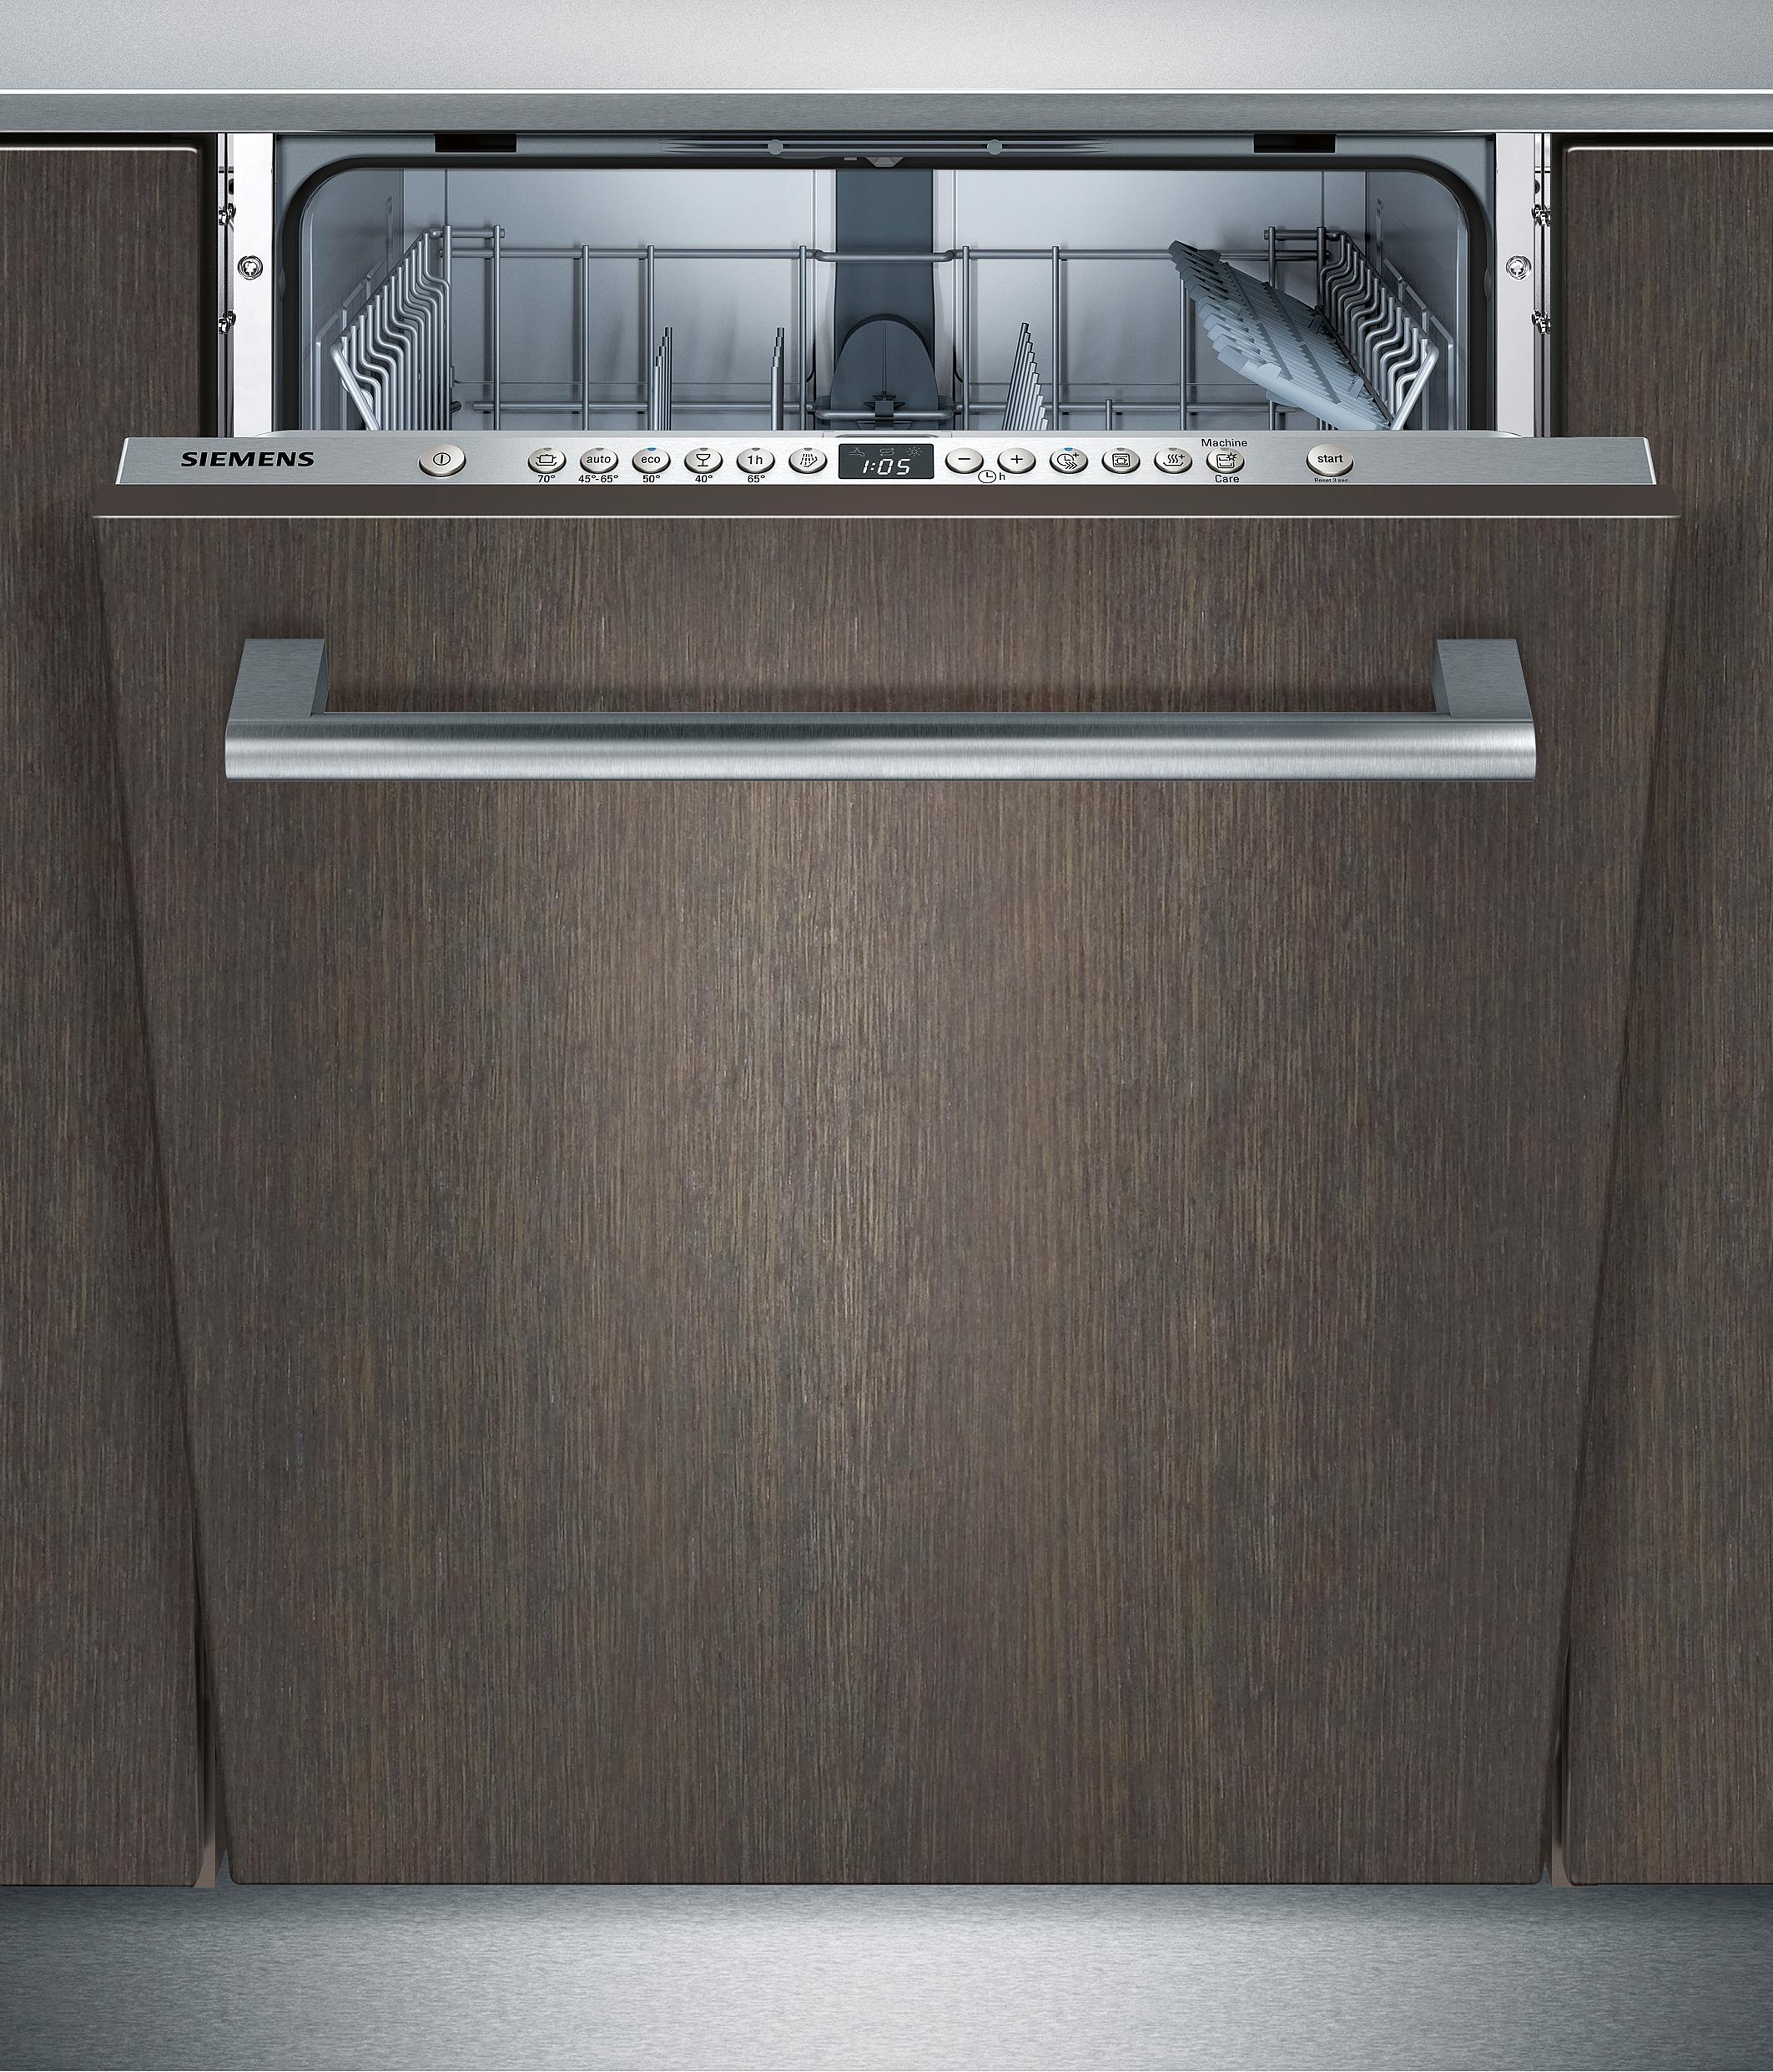 geschirrsp ler sx636x01ge gro raum geschirrsp ler 60 cm. Black Bedroom Furniture Sets. Home Design Ideas